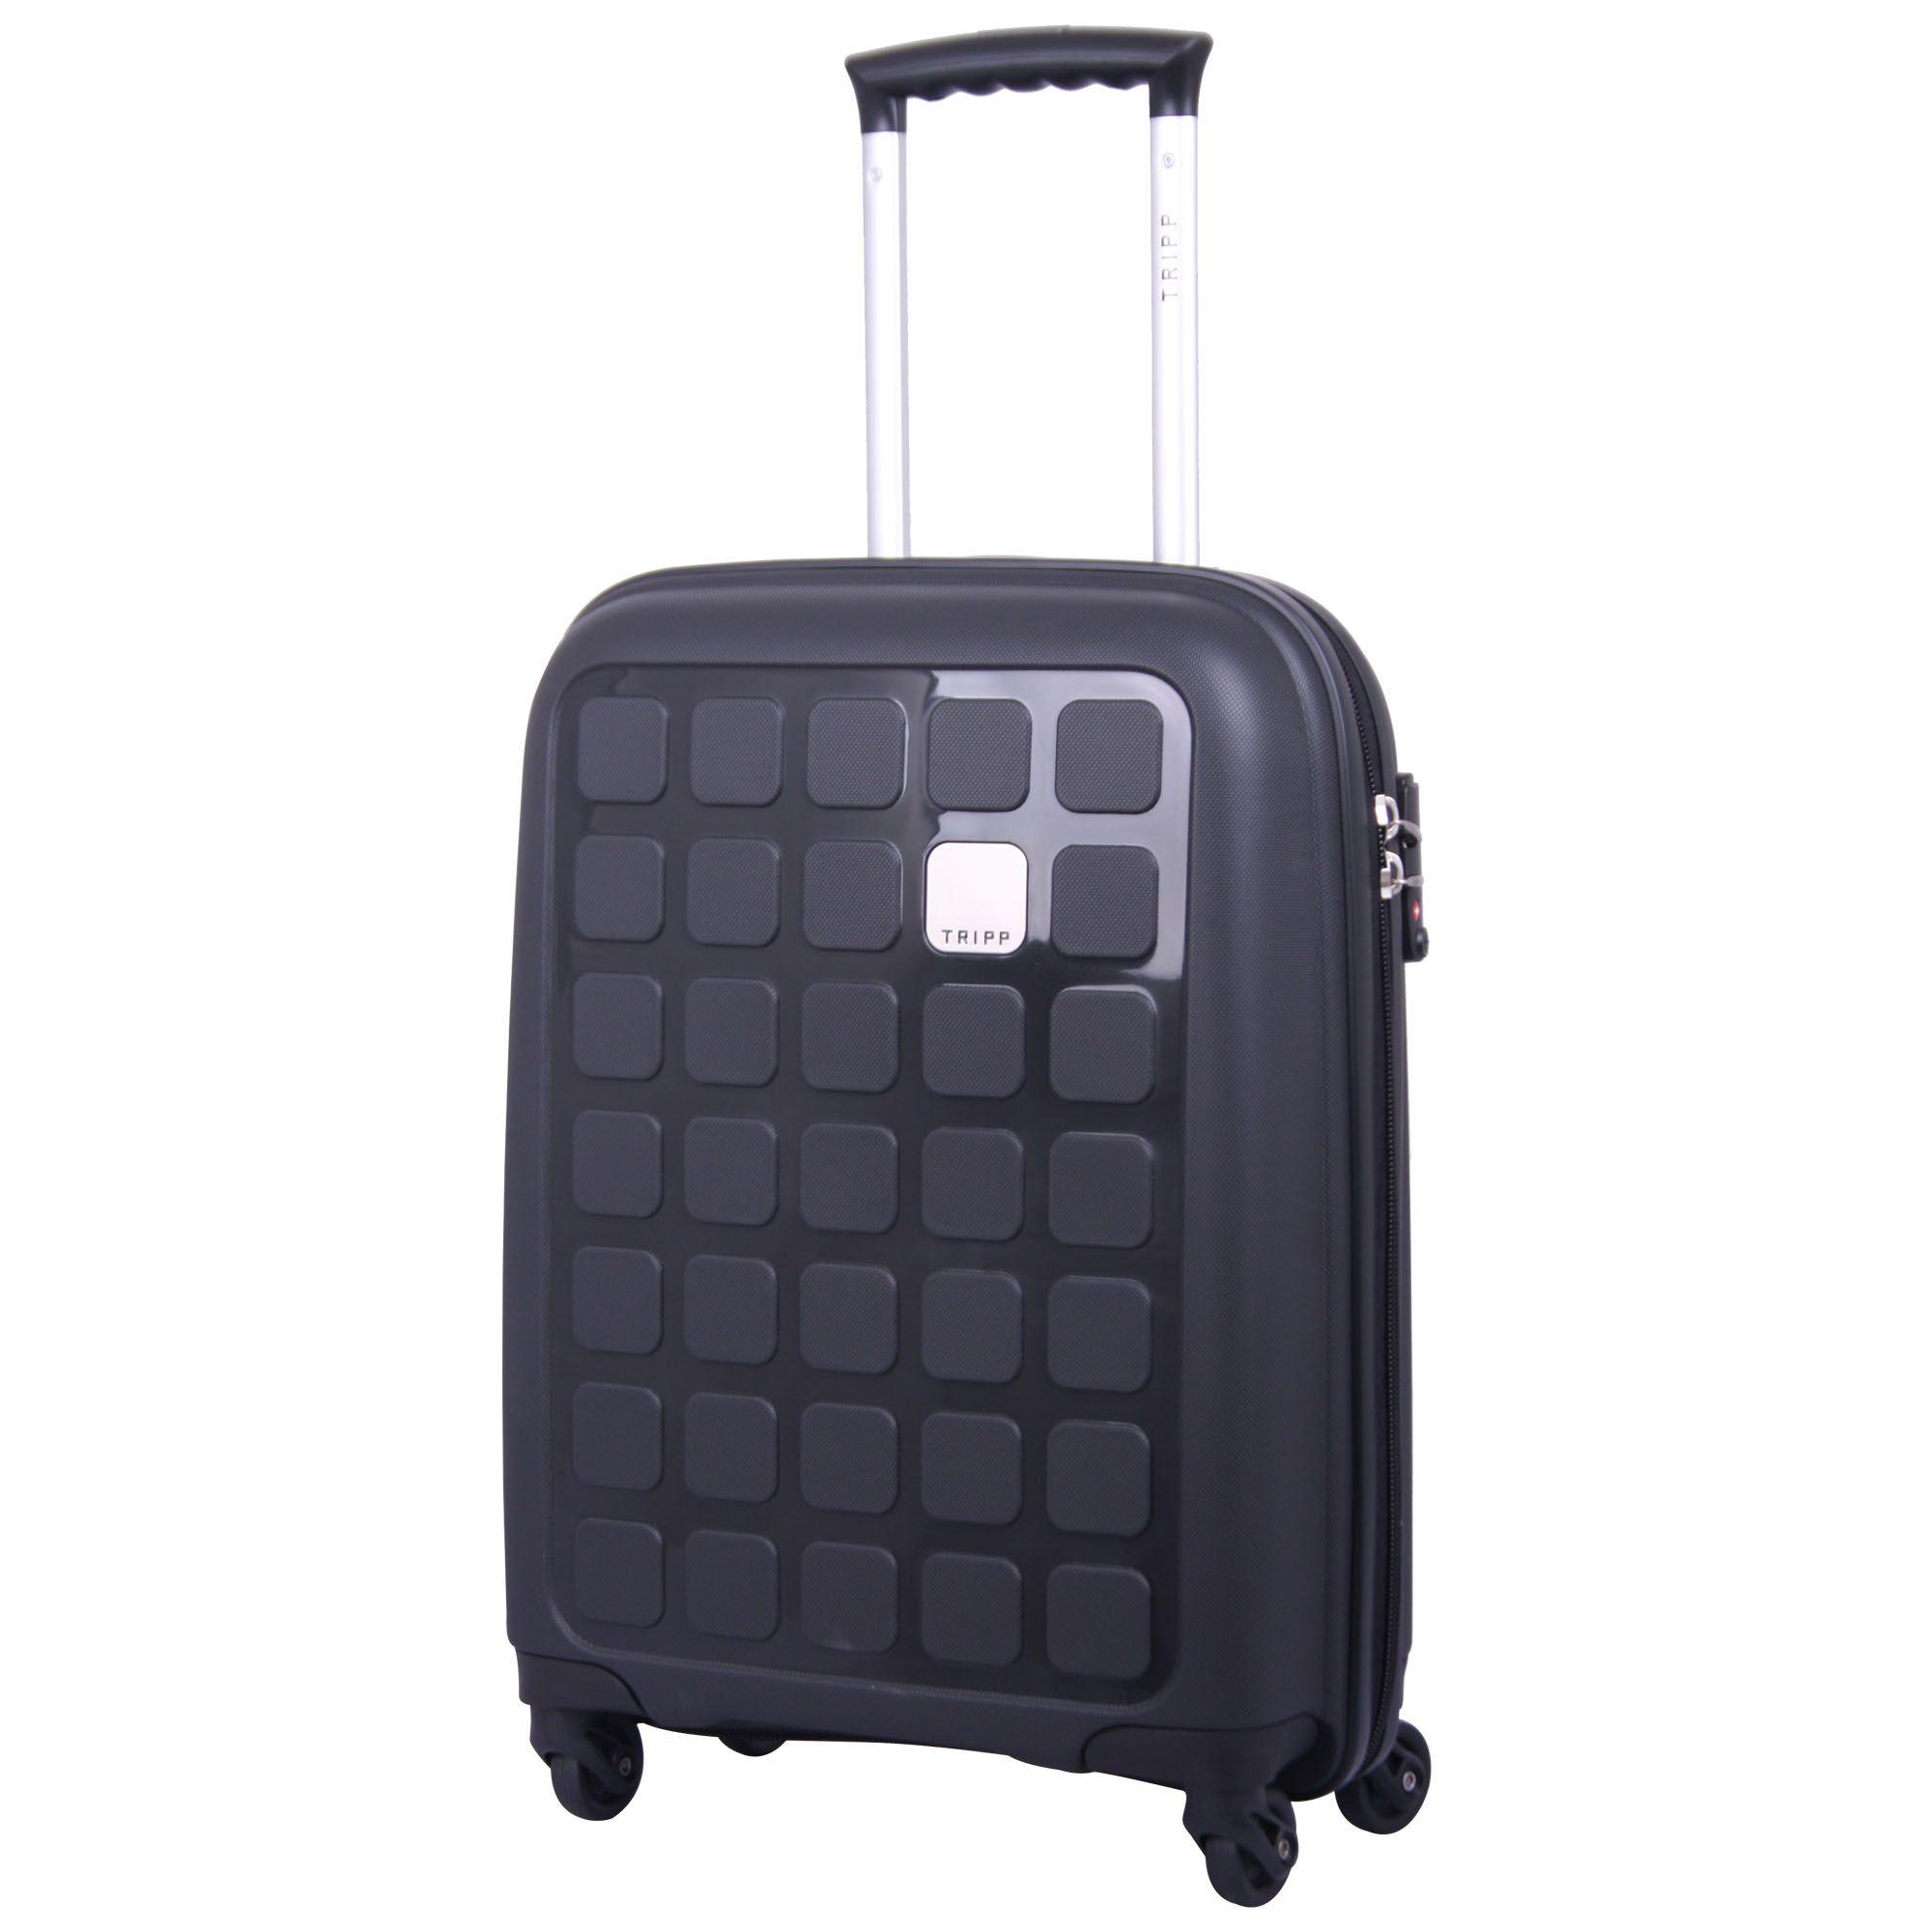 Tripp black II 'Holiday 5' cabin 4 wheel suitcase - Hard Suitcases ...